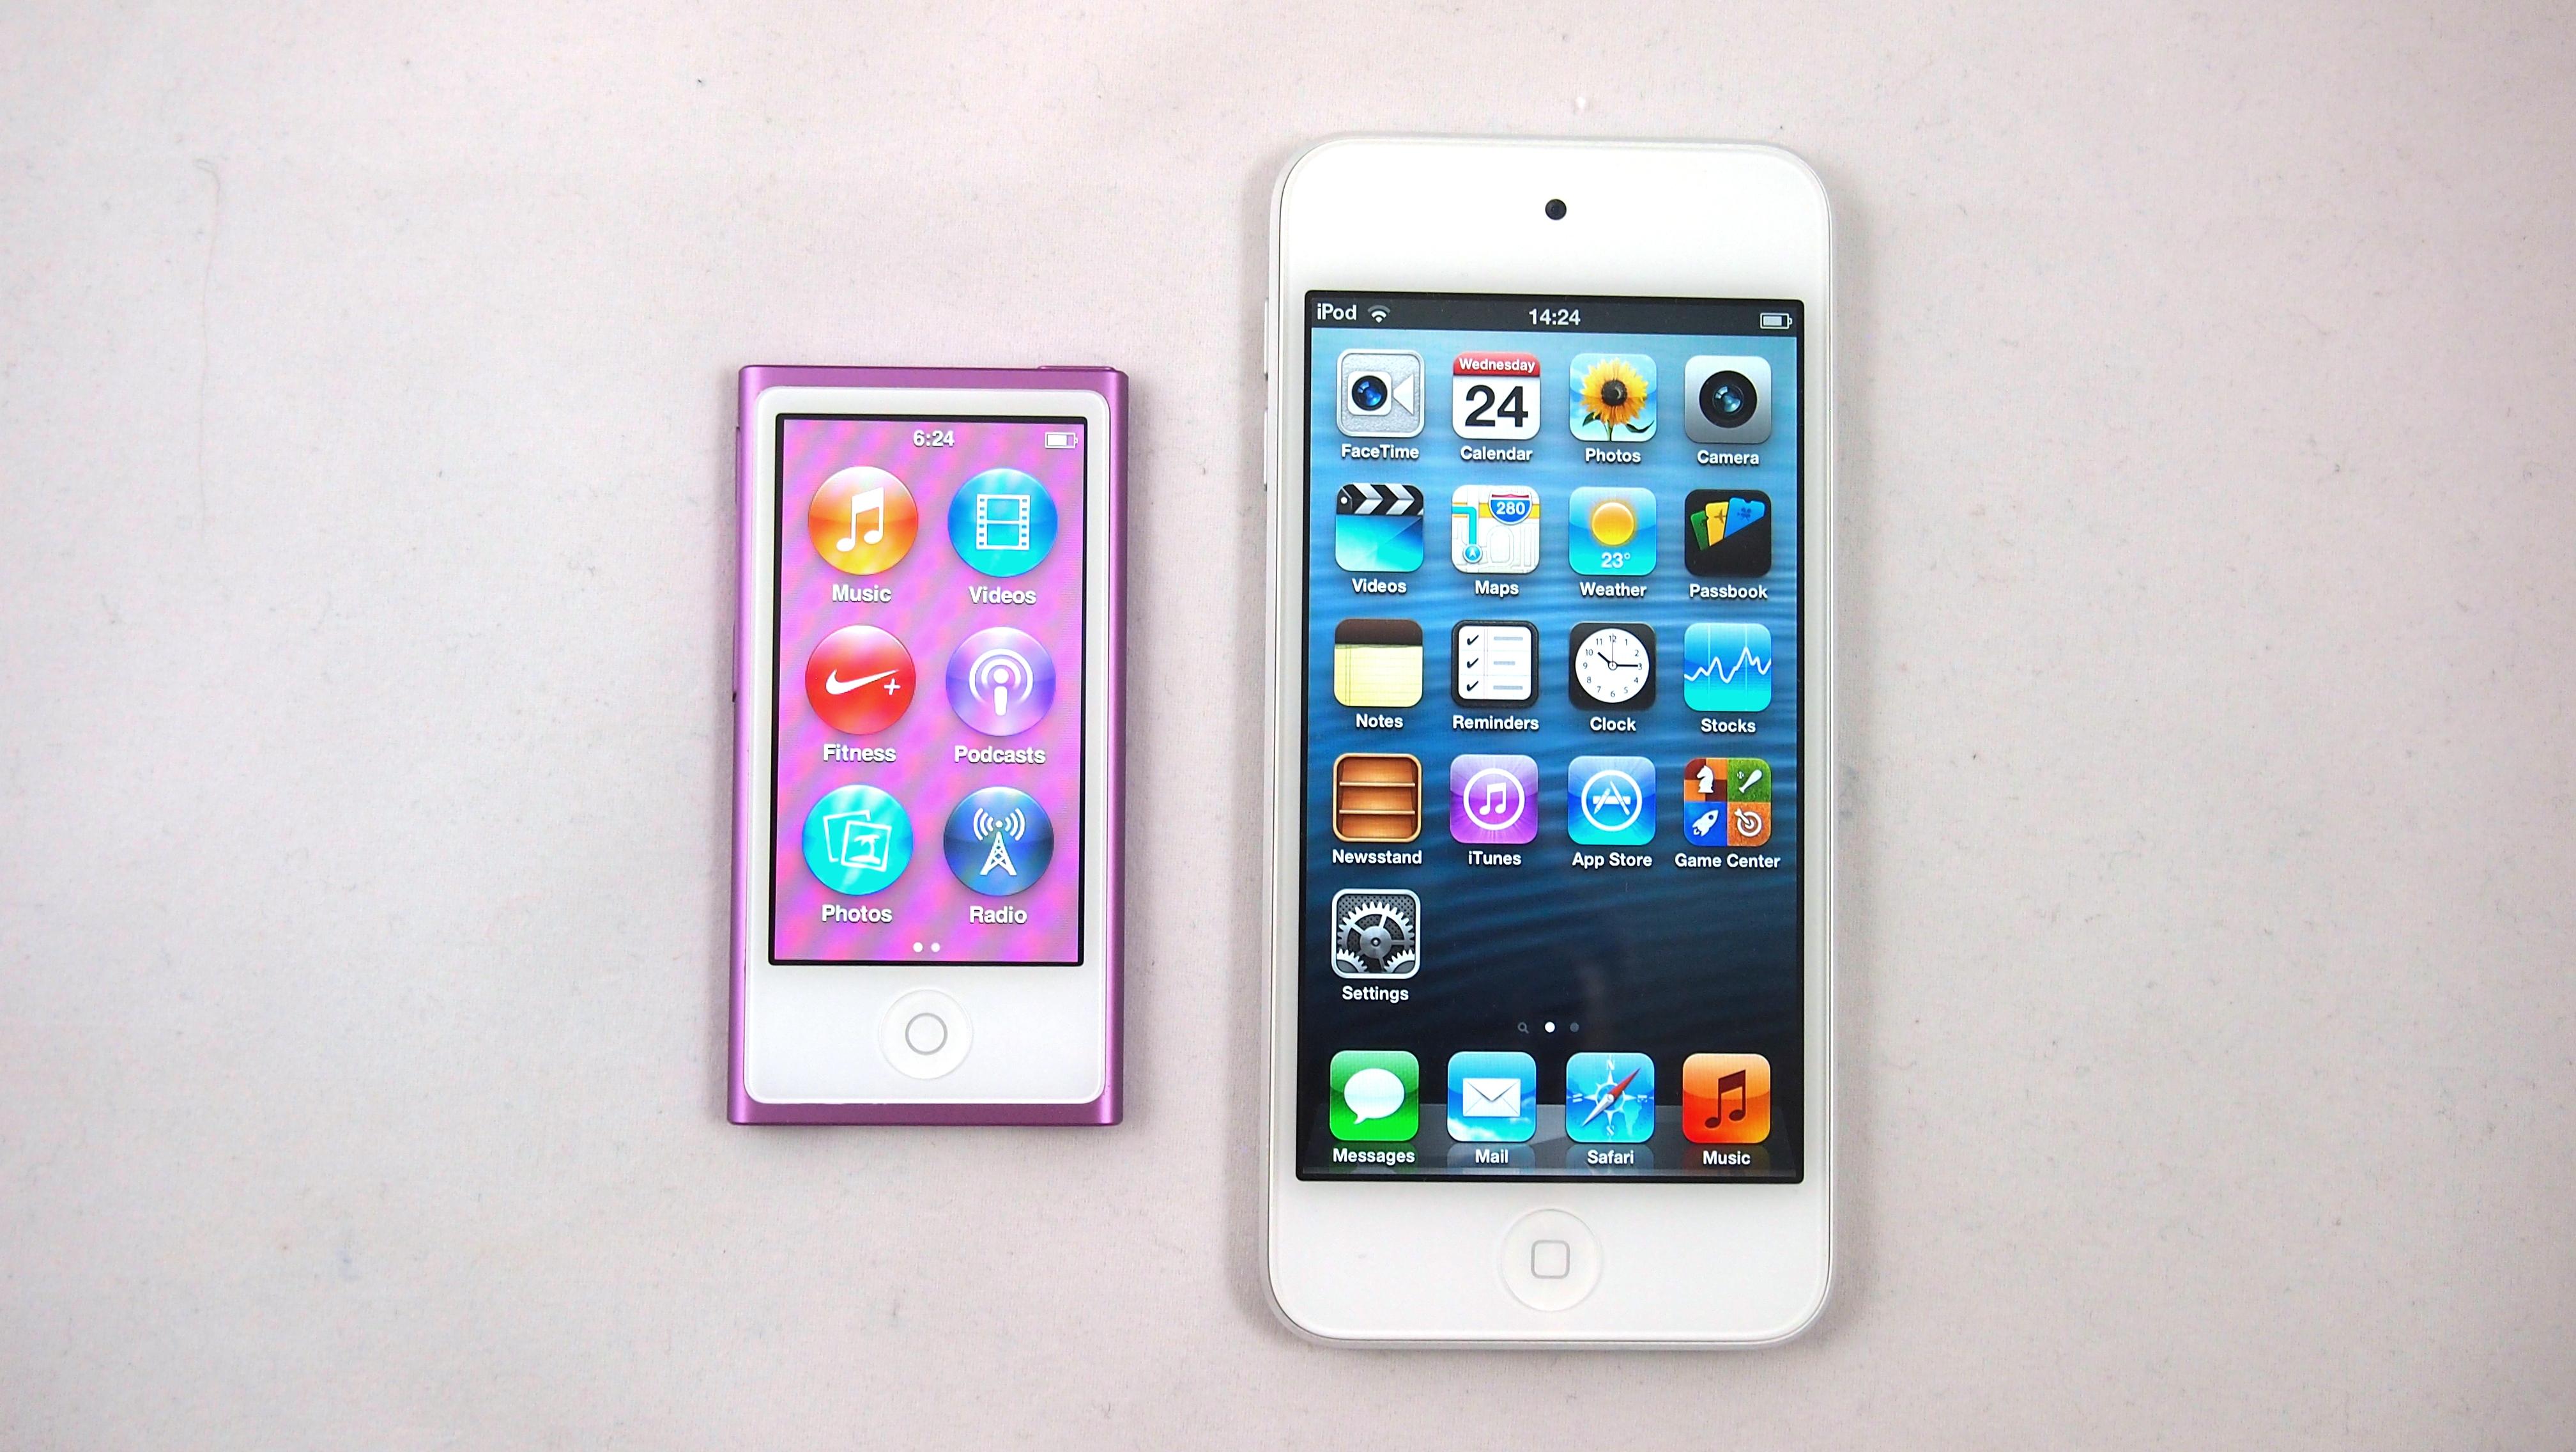 ipod touch 5th generation vs ipod nano